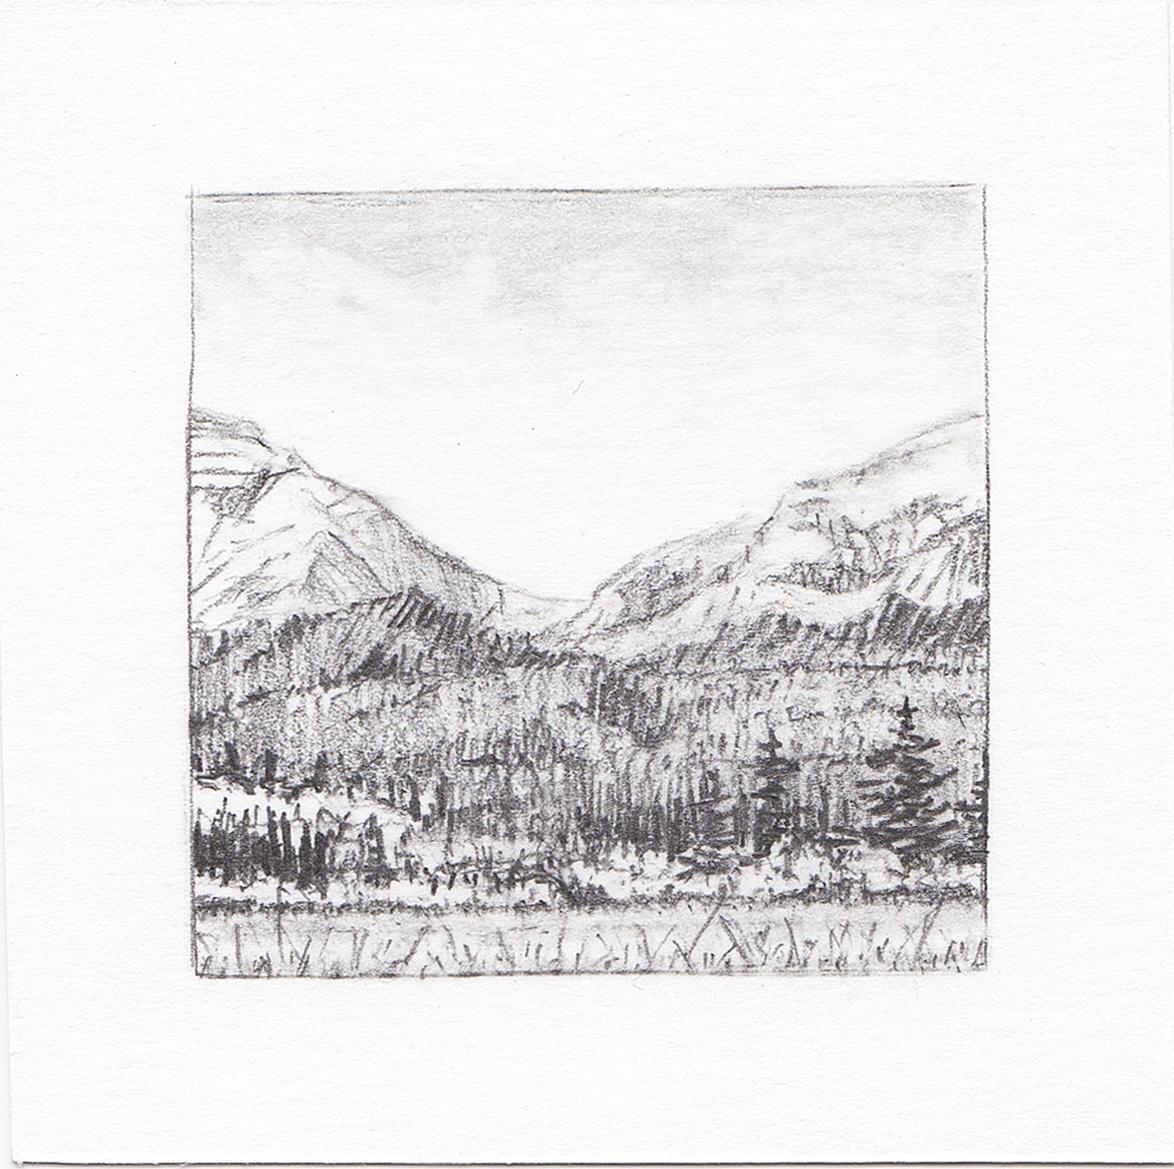 #30 Glacier National Park, Montana | 3x3 | graphite